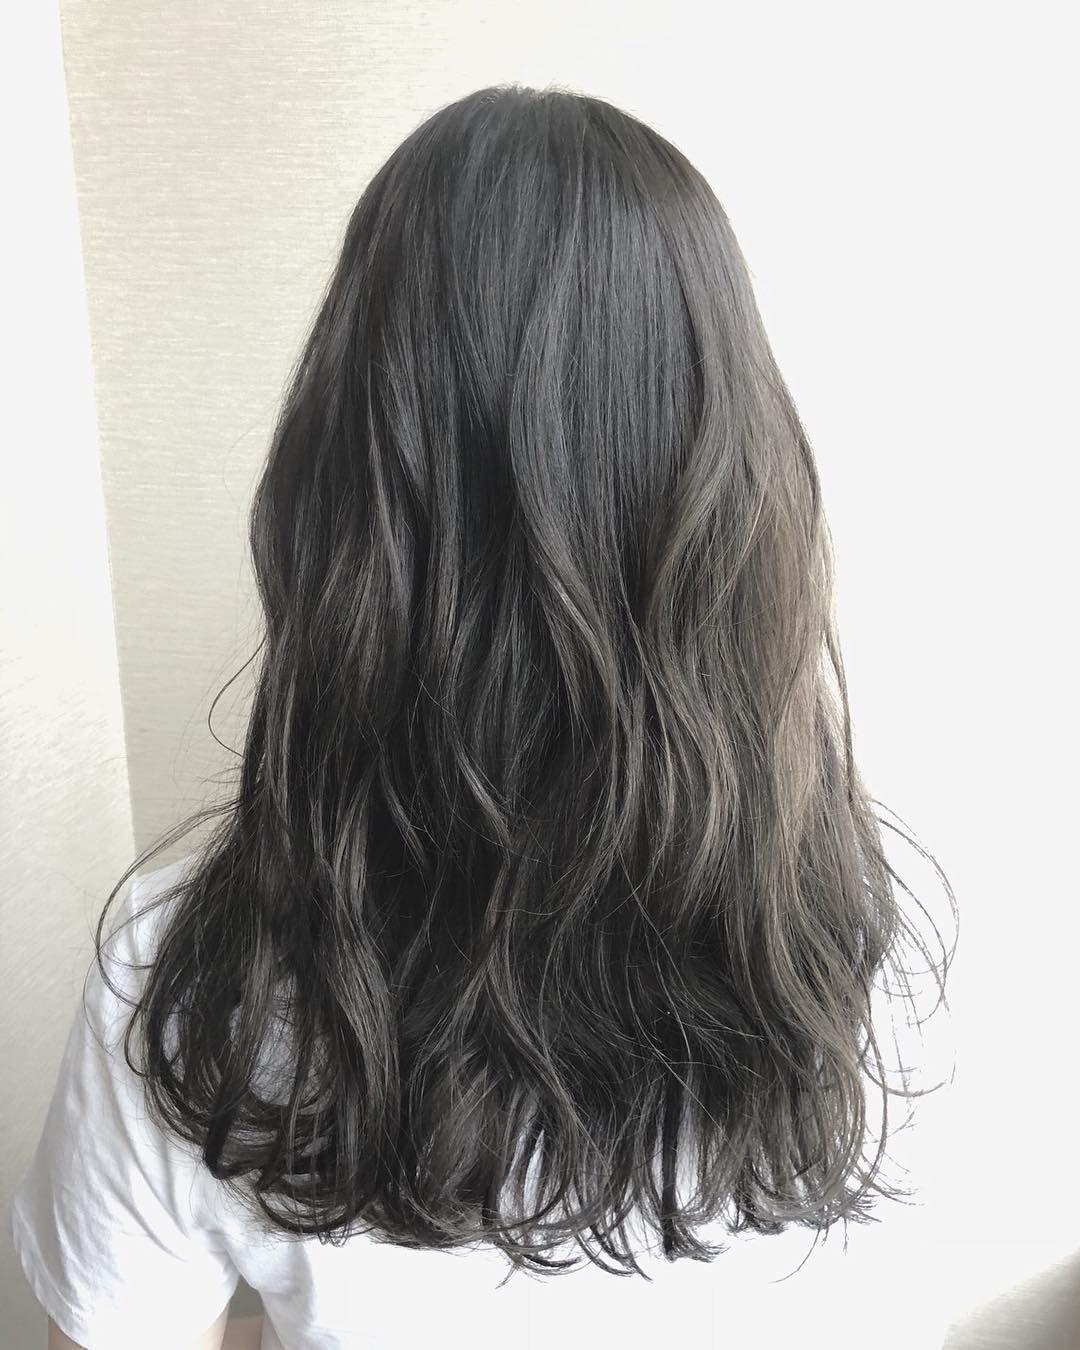 Fleveのこだわりカラーについて Fleveではお客様の髪質ダメージ